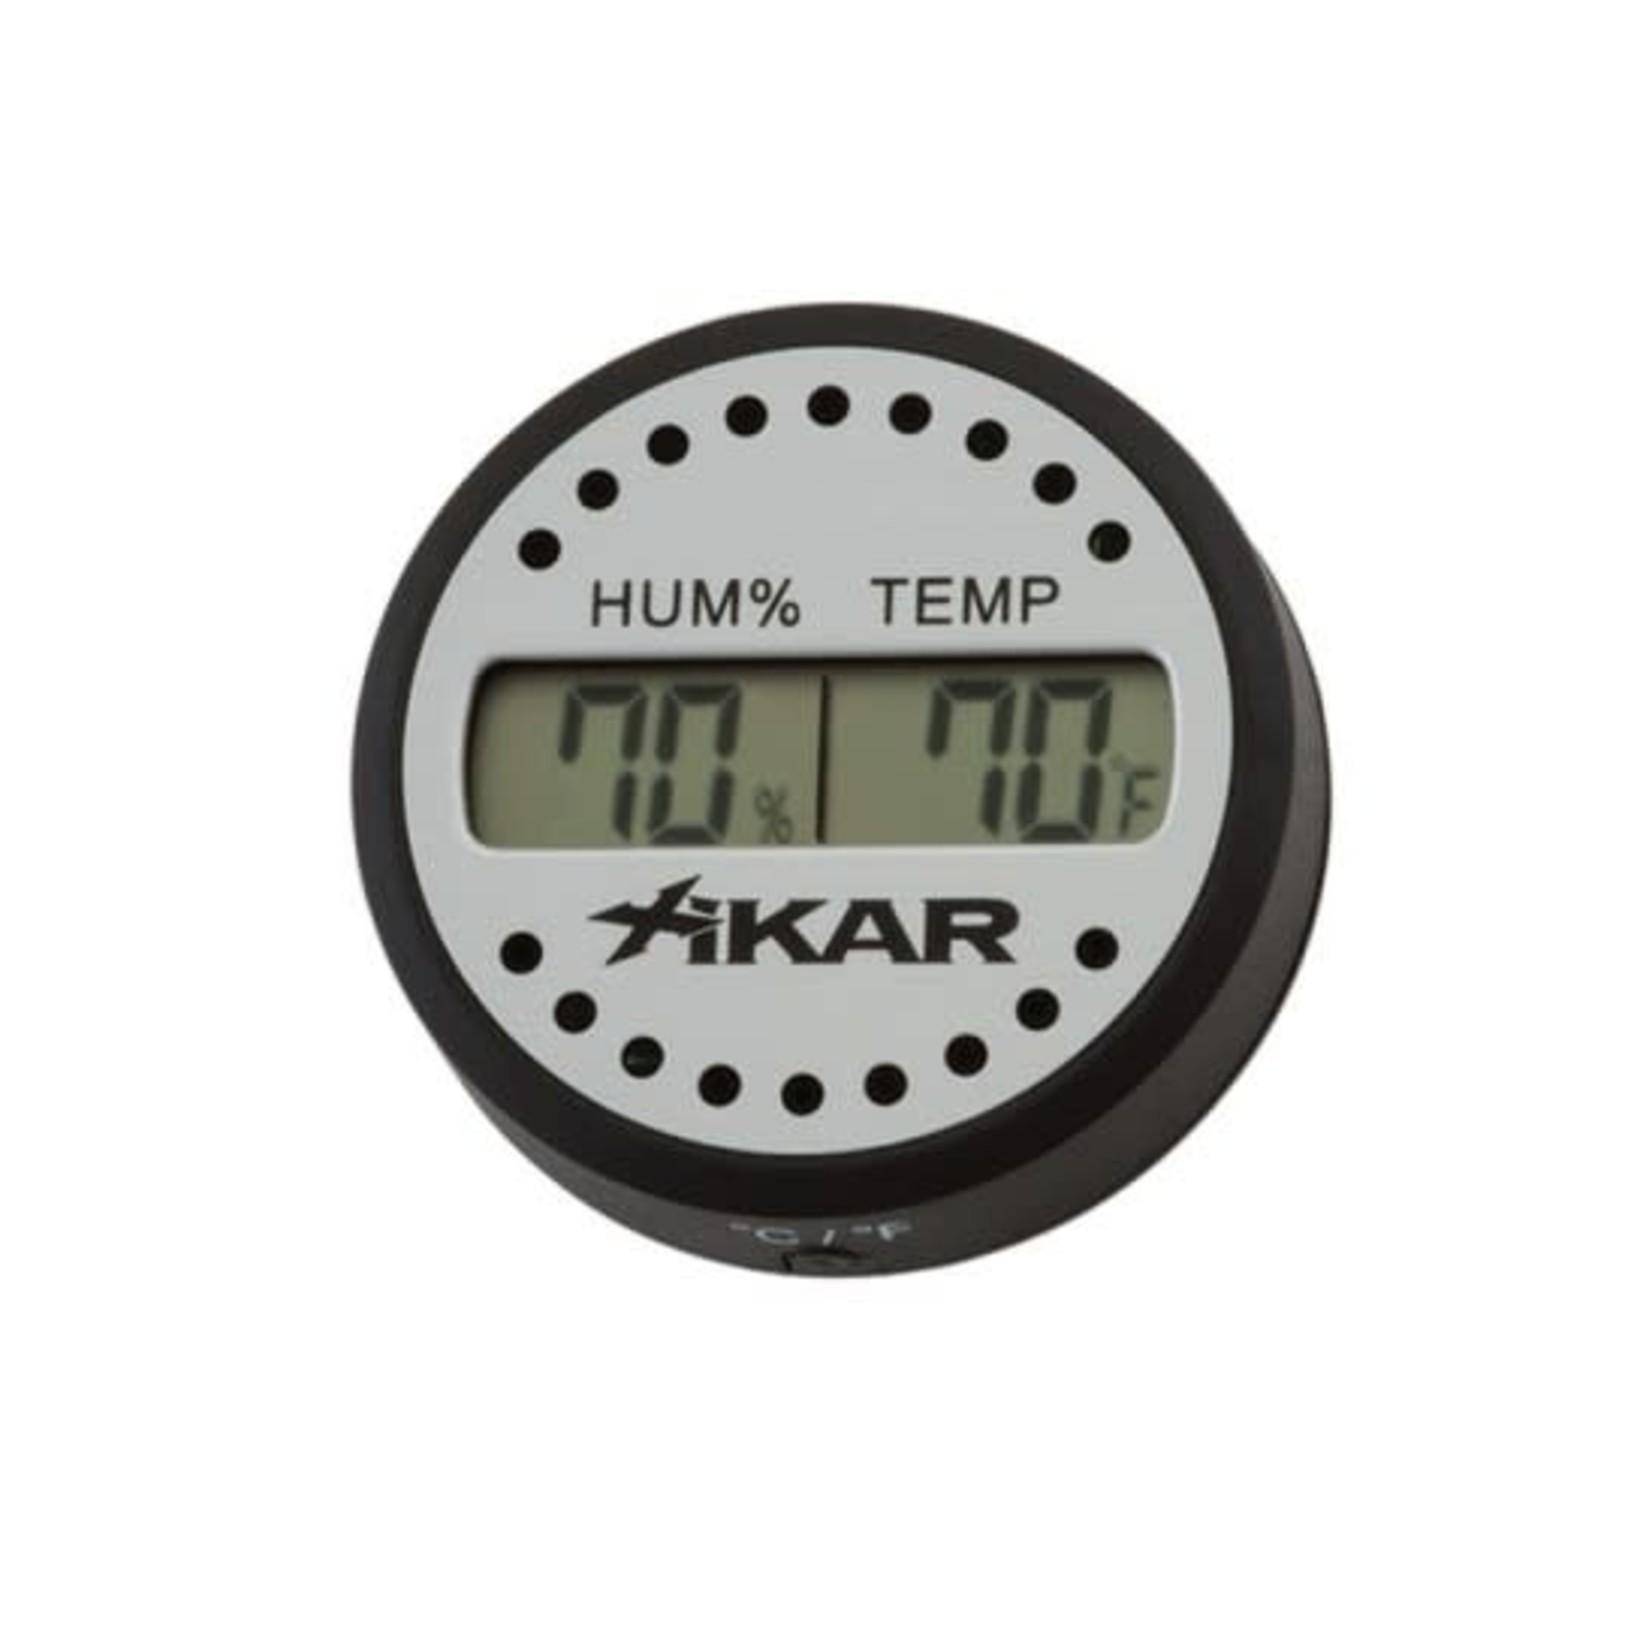 Xikar PuroTemp Digital Hygrometer